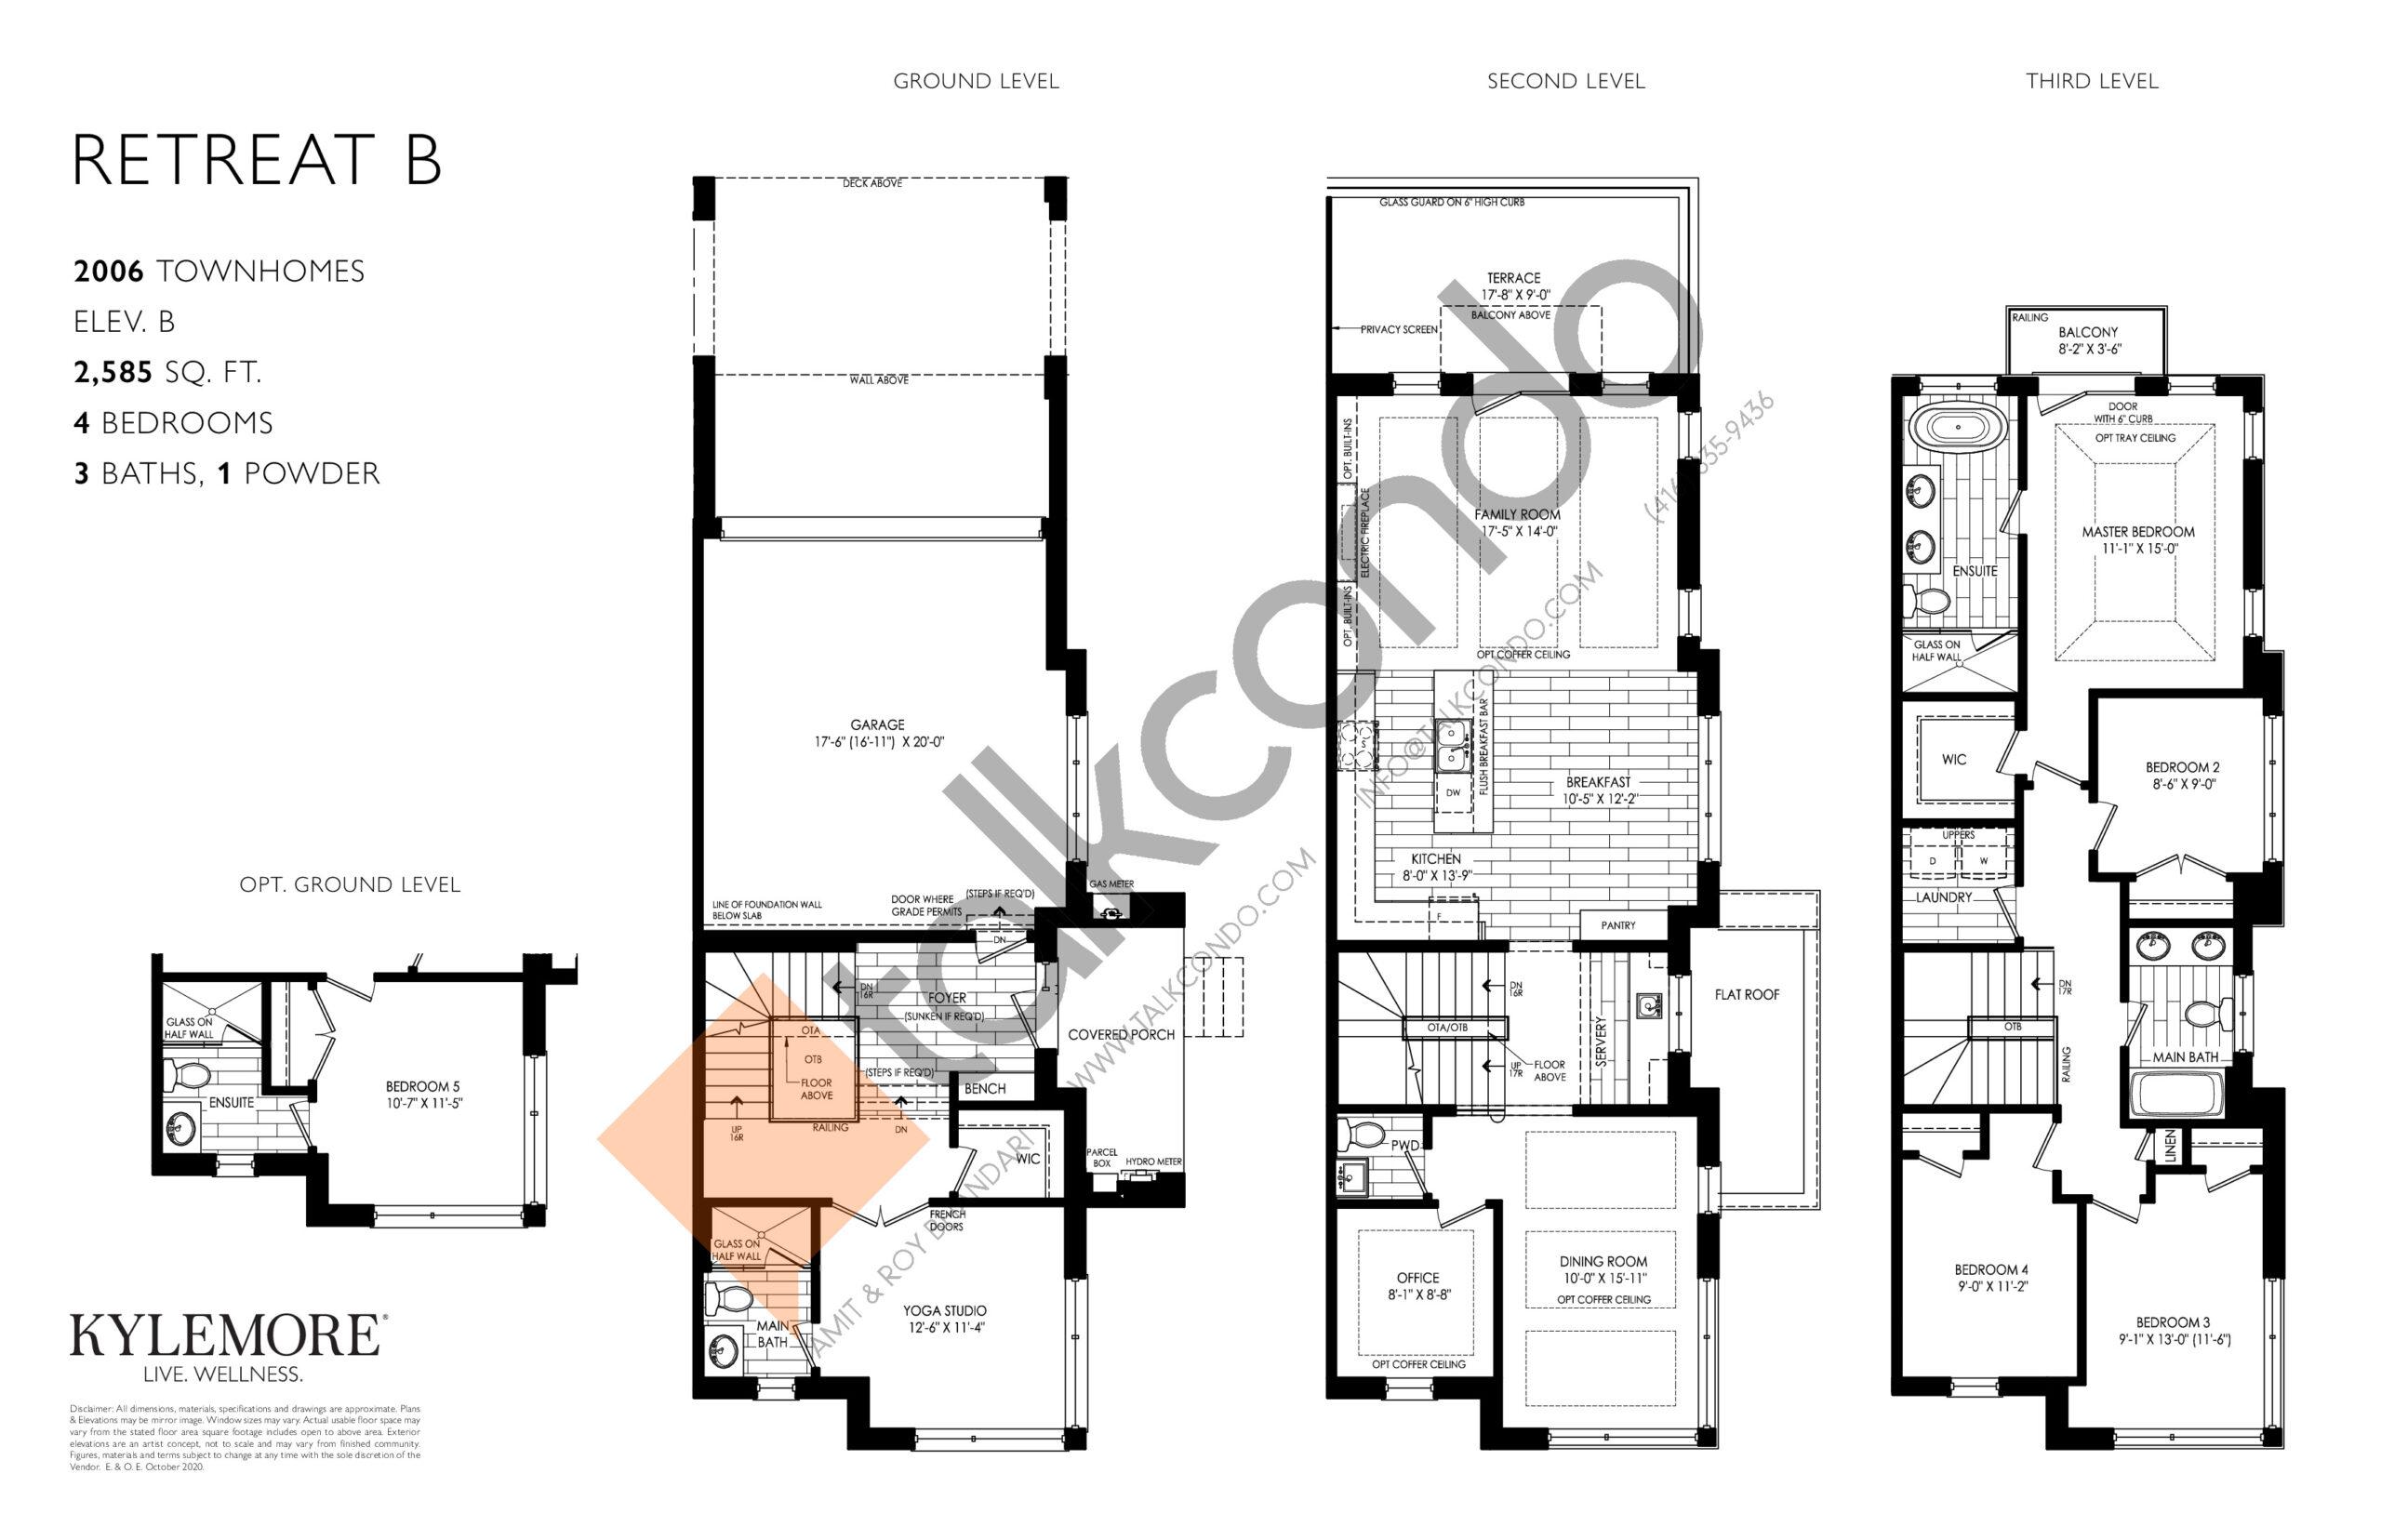 Retreat B Floor Plan at Angus Glen South Village - 2585 sq.ft